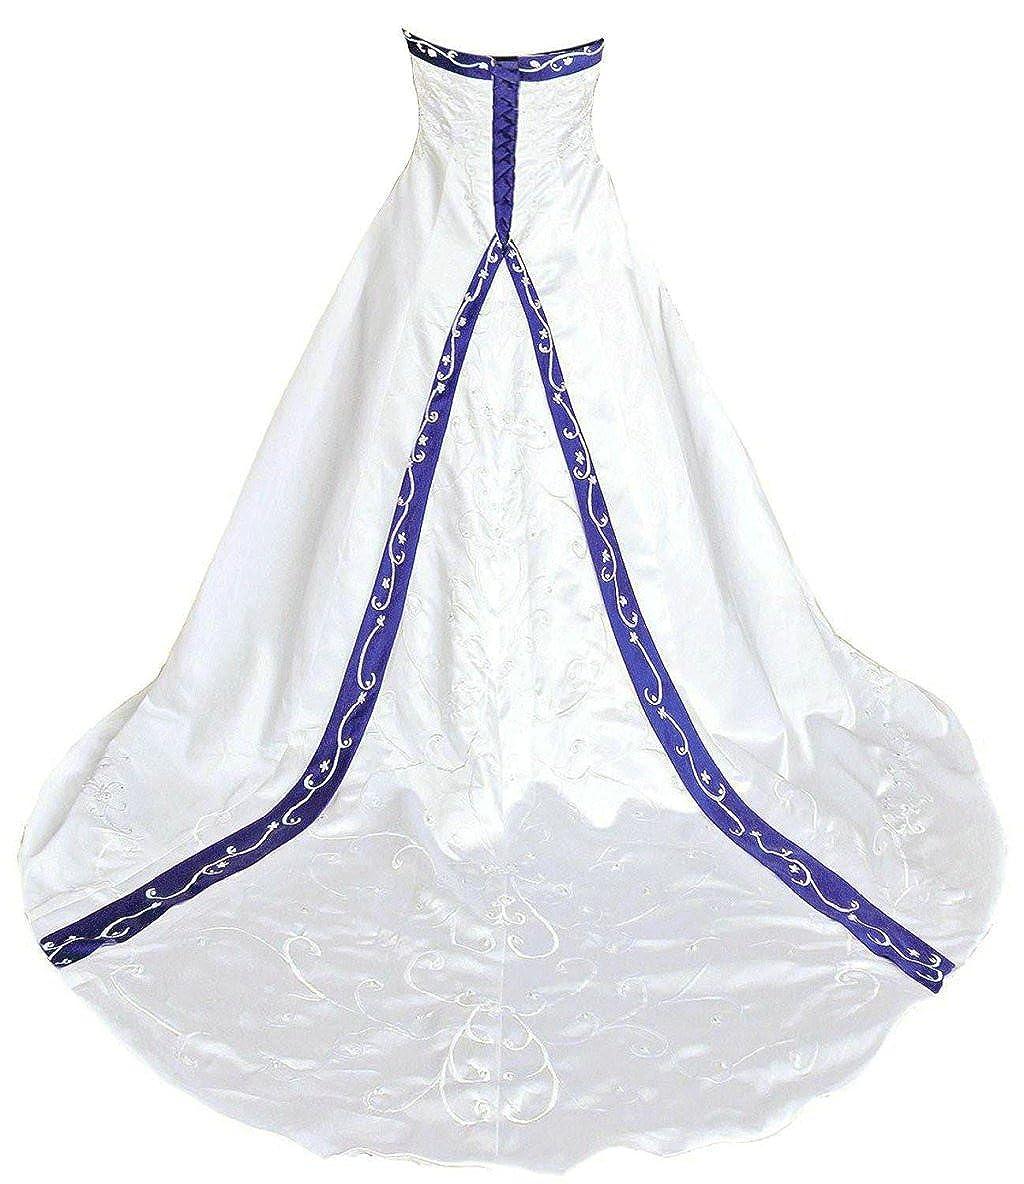 Ivory & bluee Vantexi Women's Elegant Strapless Embroidery Wedding Dress Bridal Gown